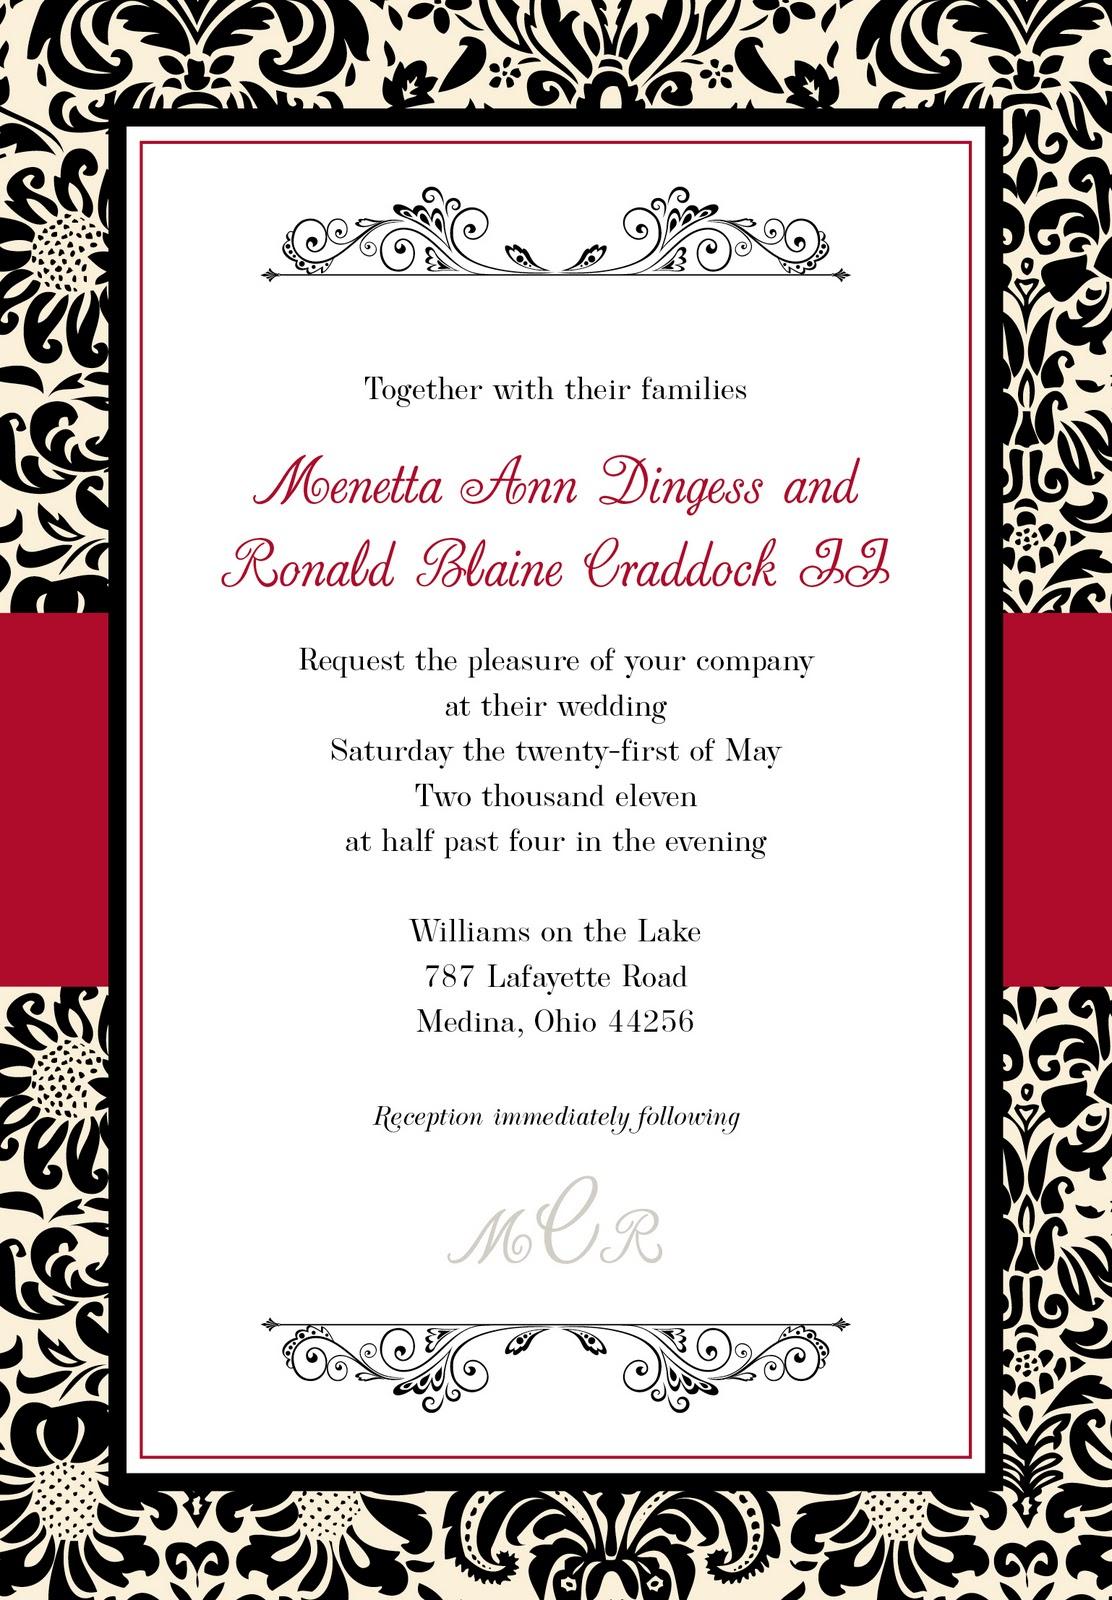 diy red and black wedding invitations damask wedding invitations Printable Red And Black Wedding Invitations Invitation Card